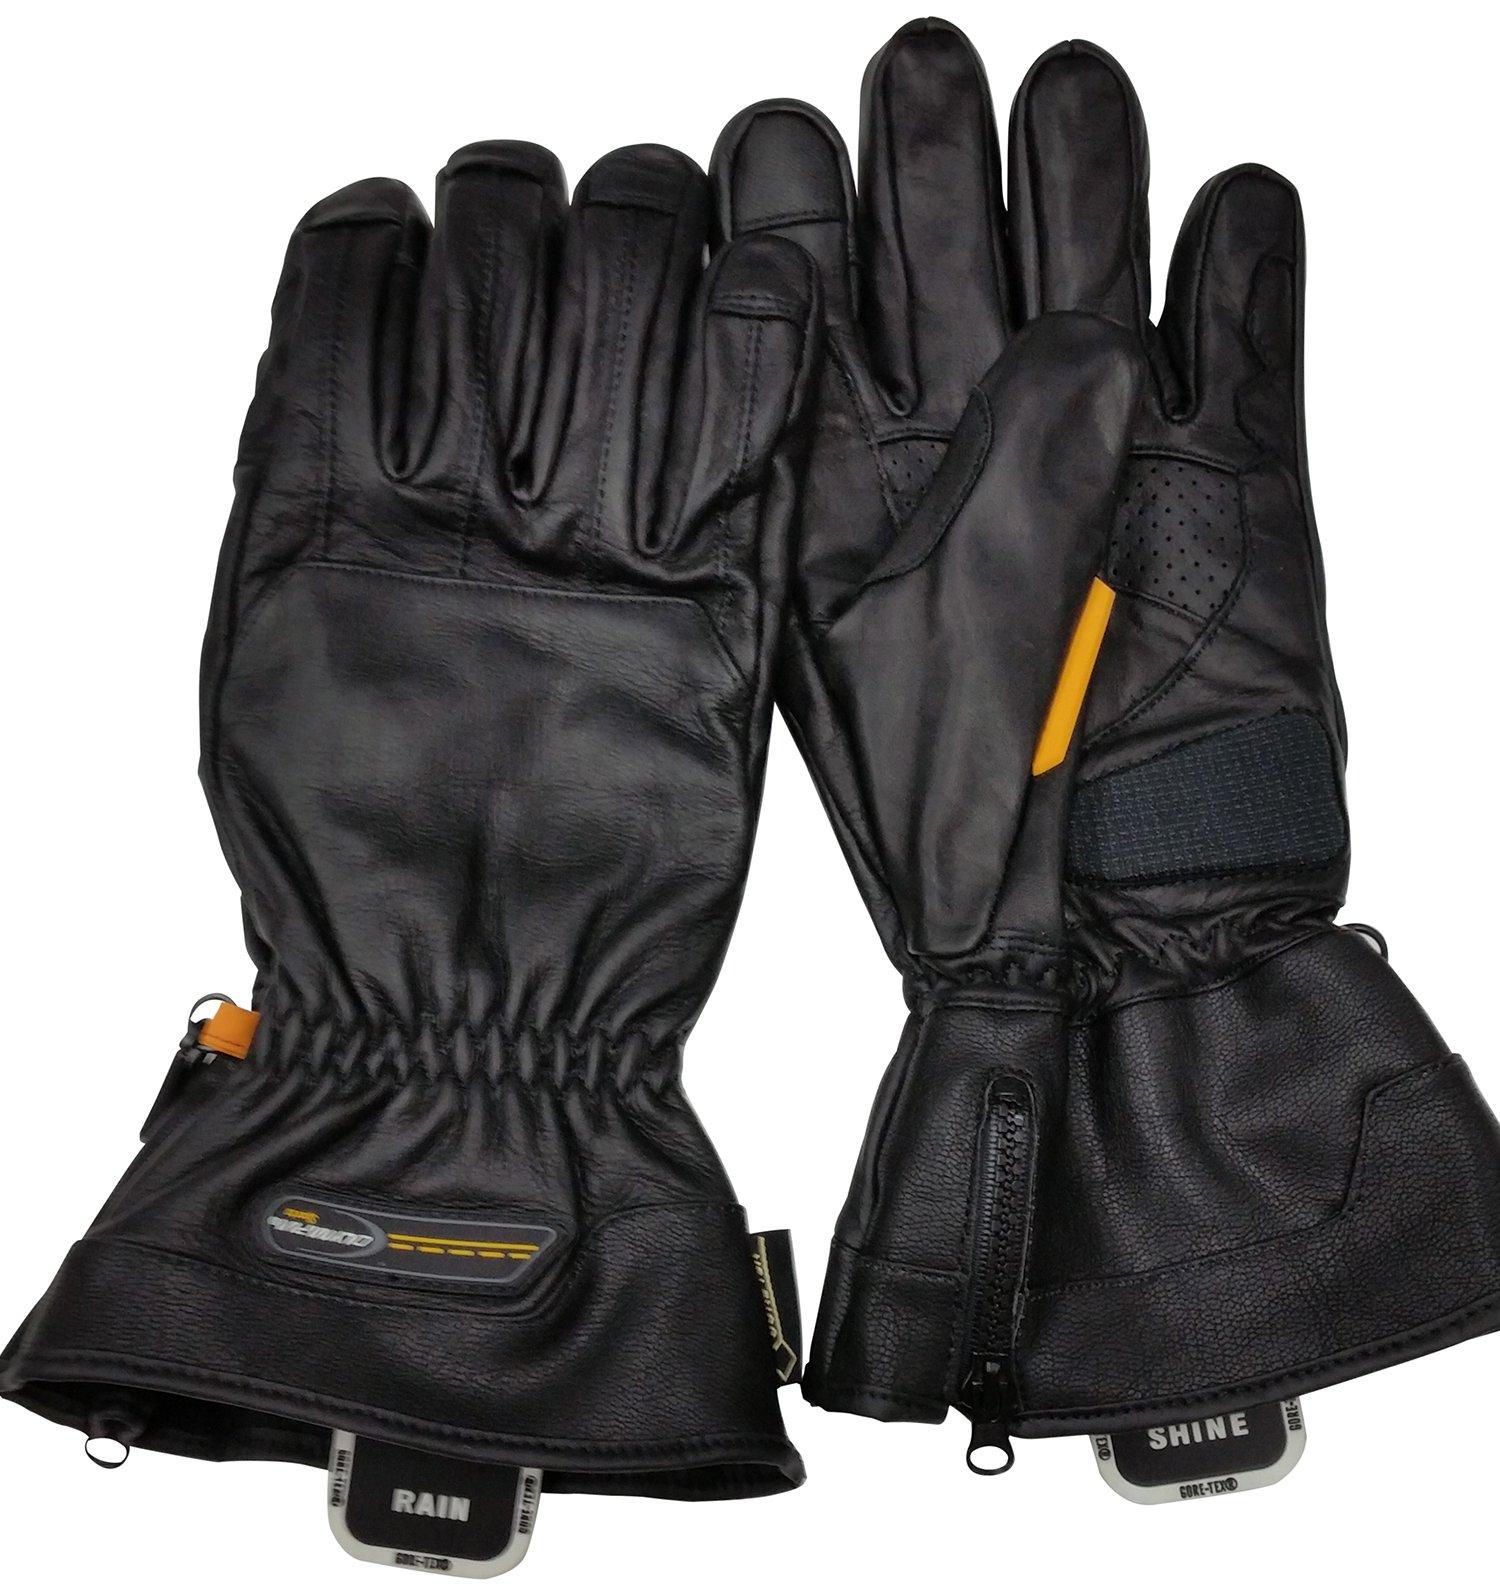 Olympia Sports Men's Gore-Tex Rain or Shine Gloves (Black, Large)